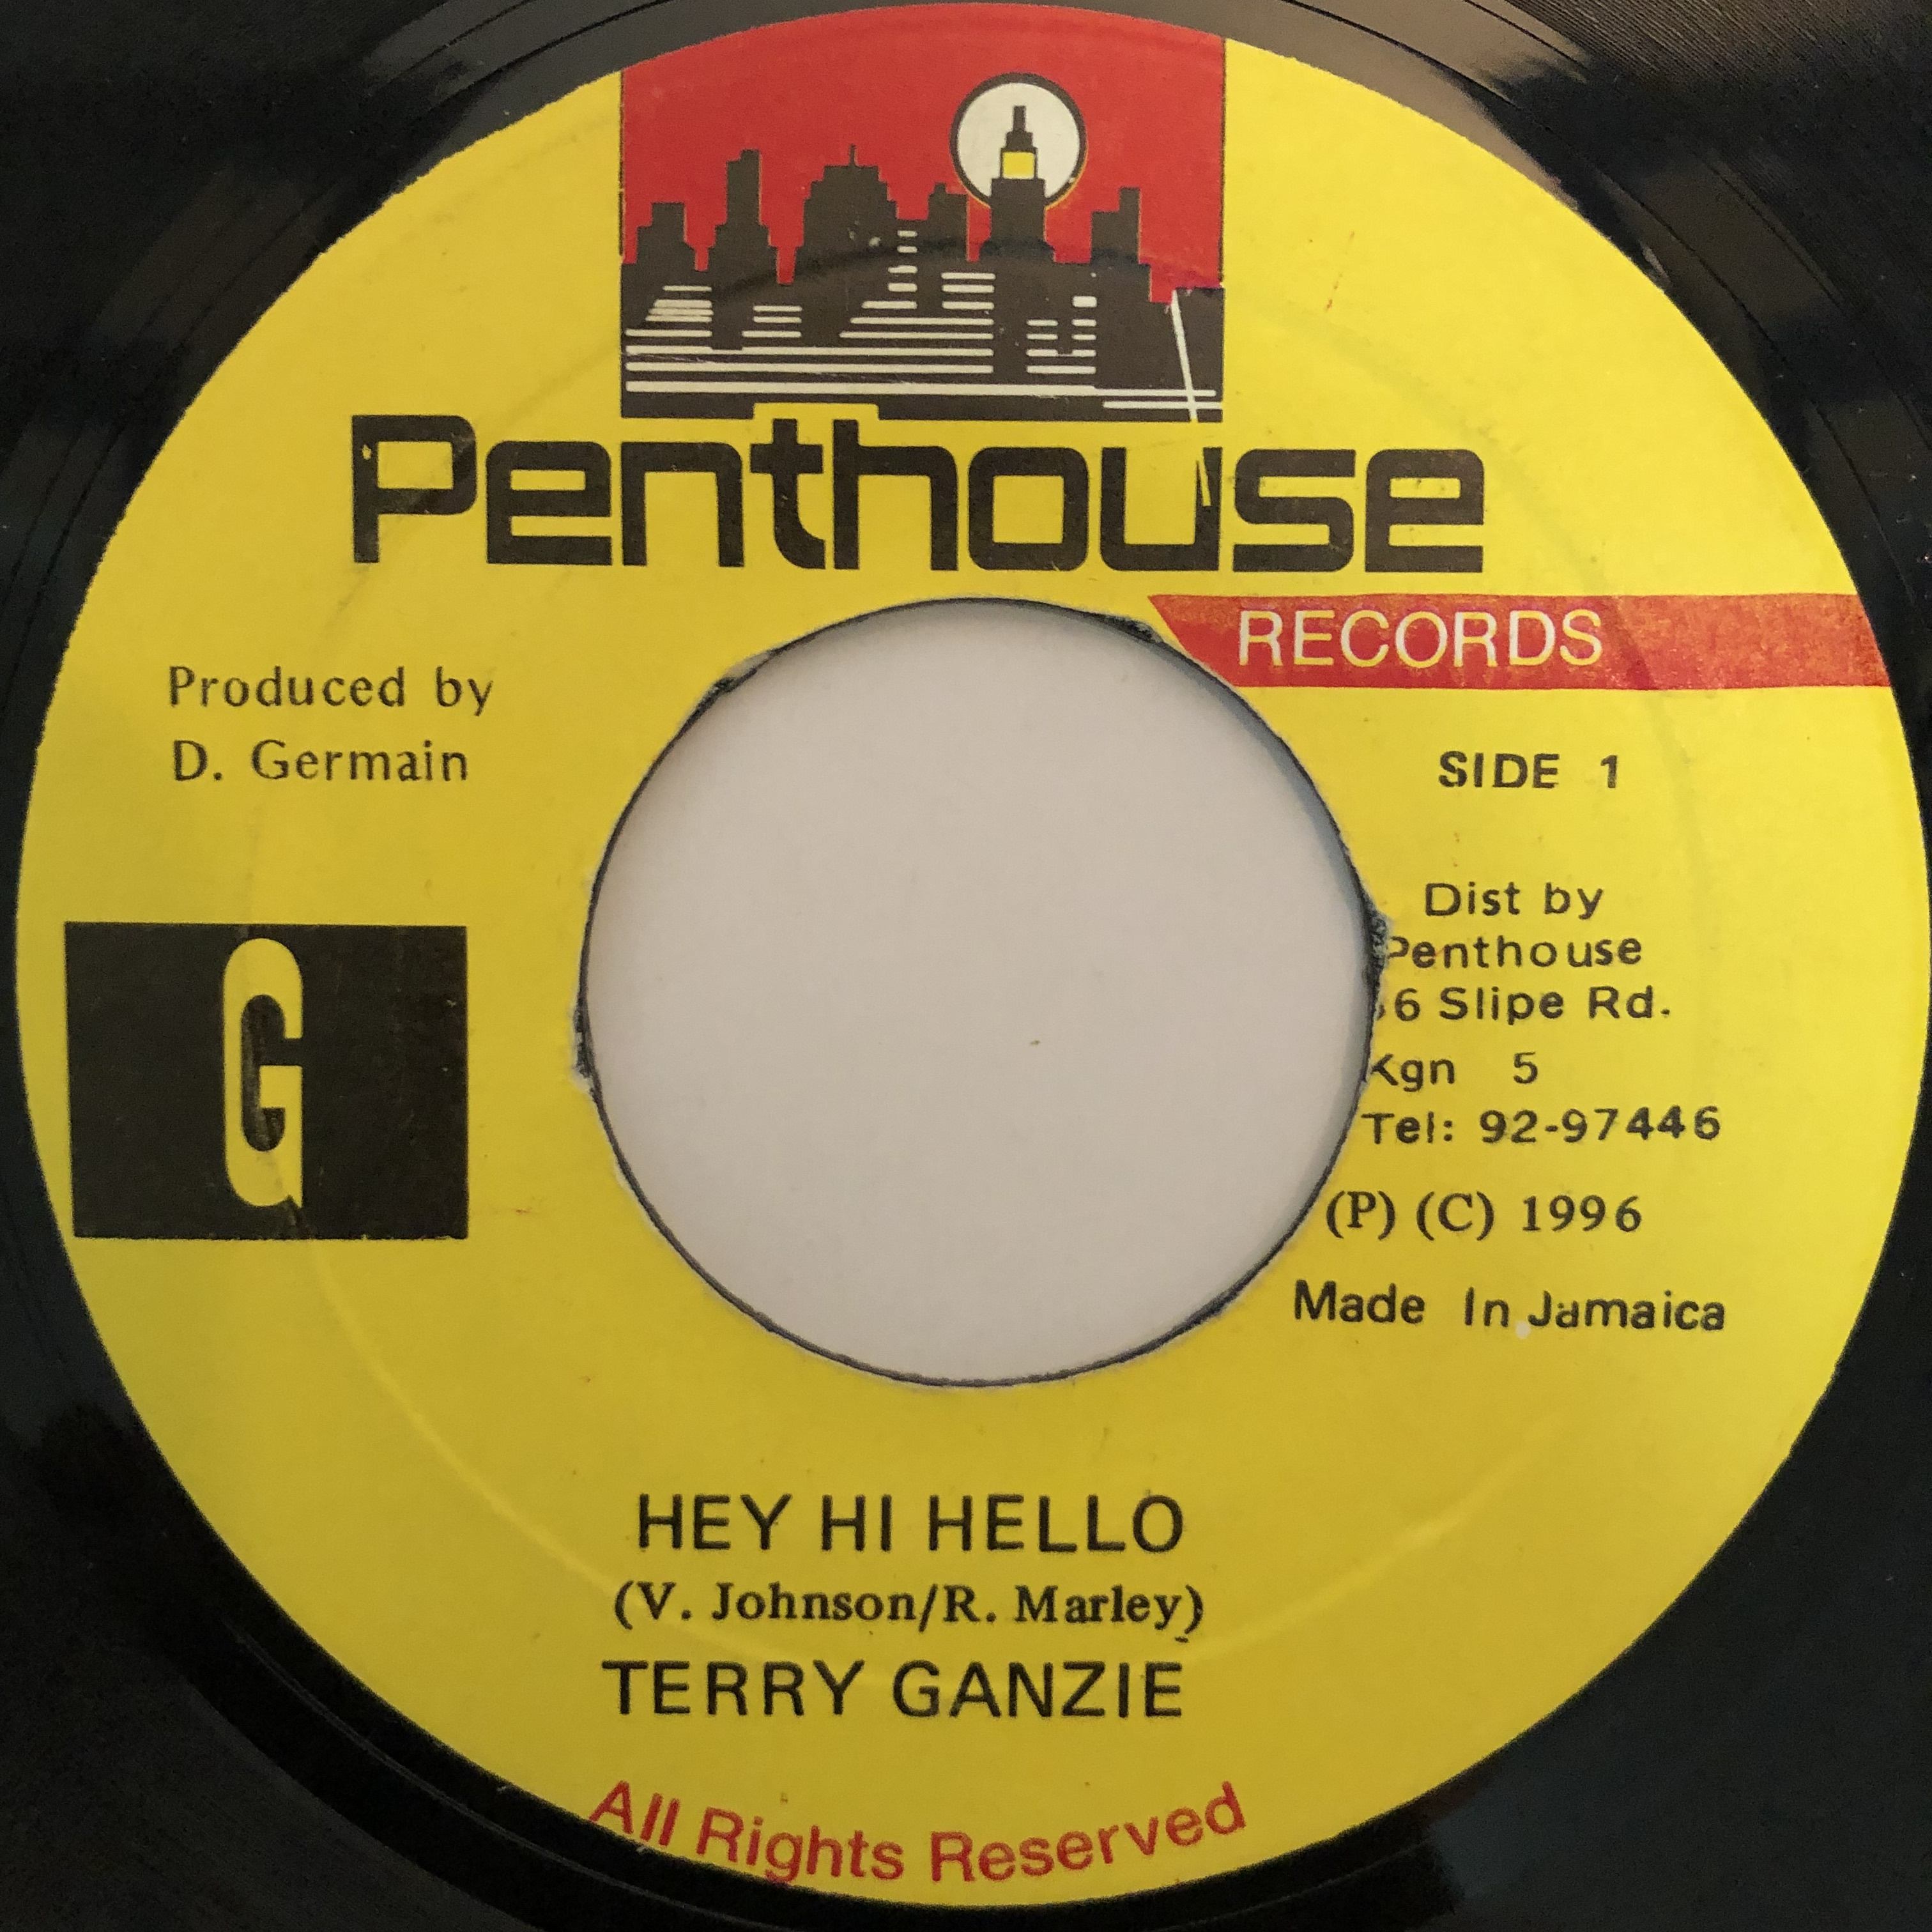 Terry Ganzie(テリーガンジー) - Hey Hi Hello【7-20271】